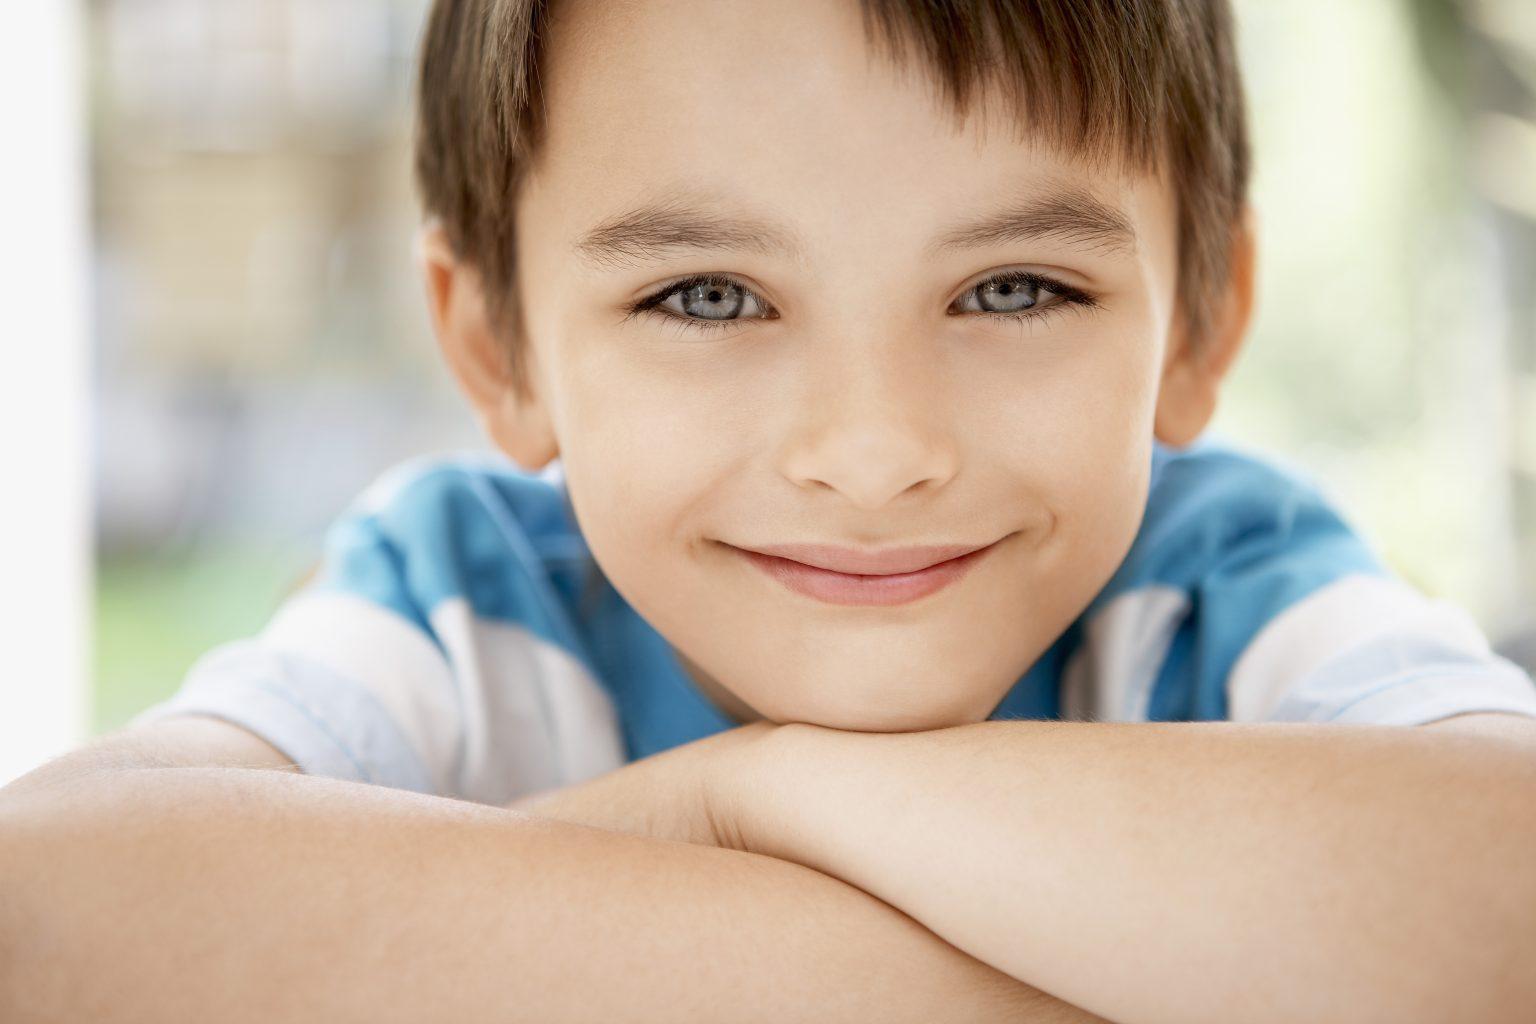 A boy speech language therapy autism spectrum disorder 1536x1024 1